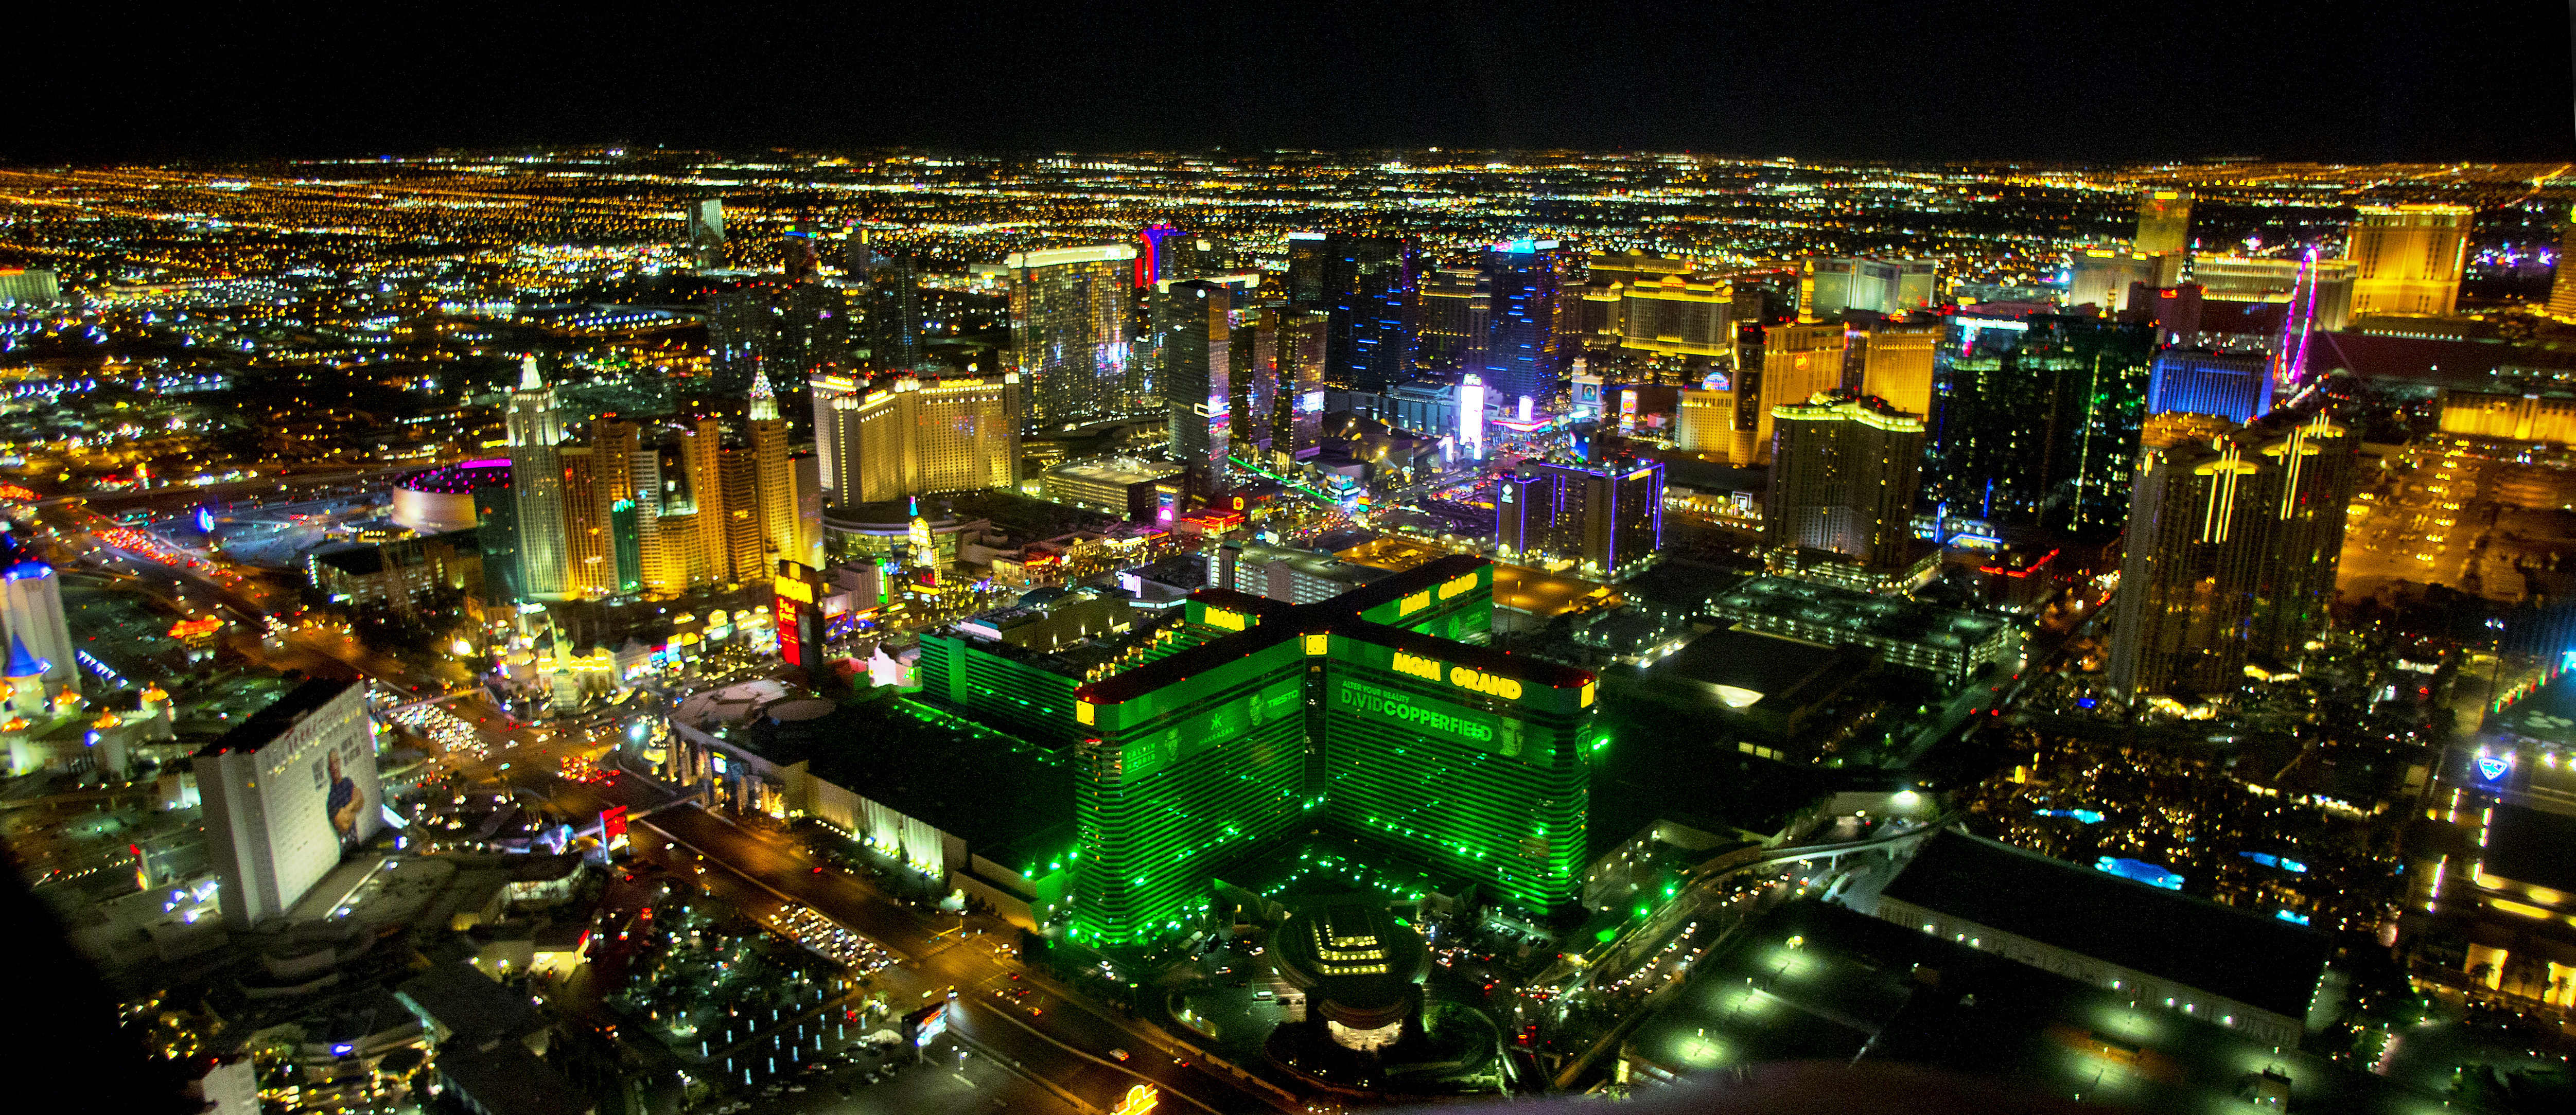 A night-time view of Las Vegas. Credit: PA